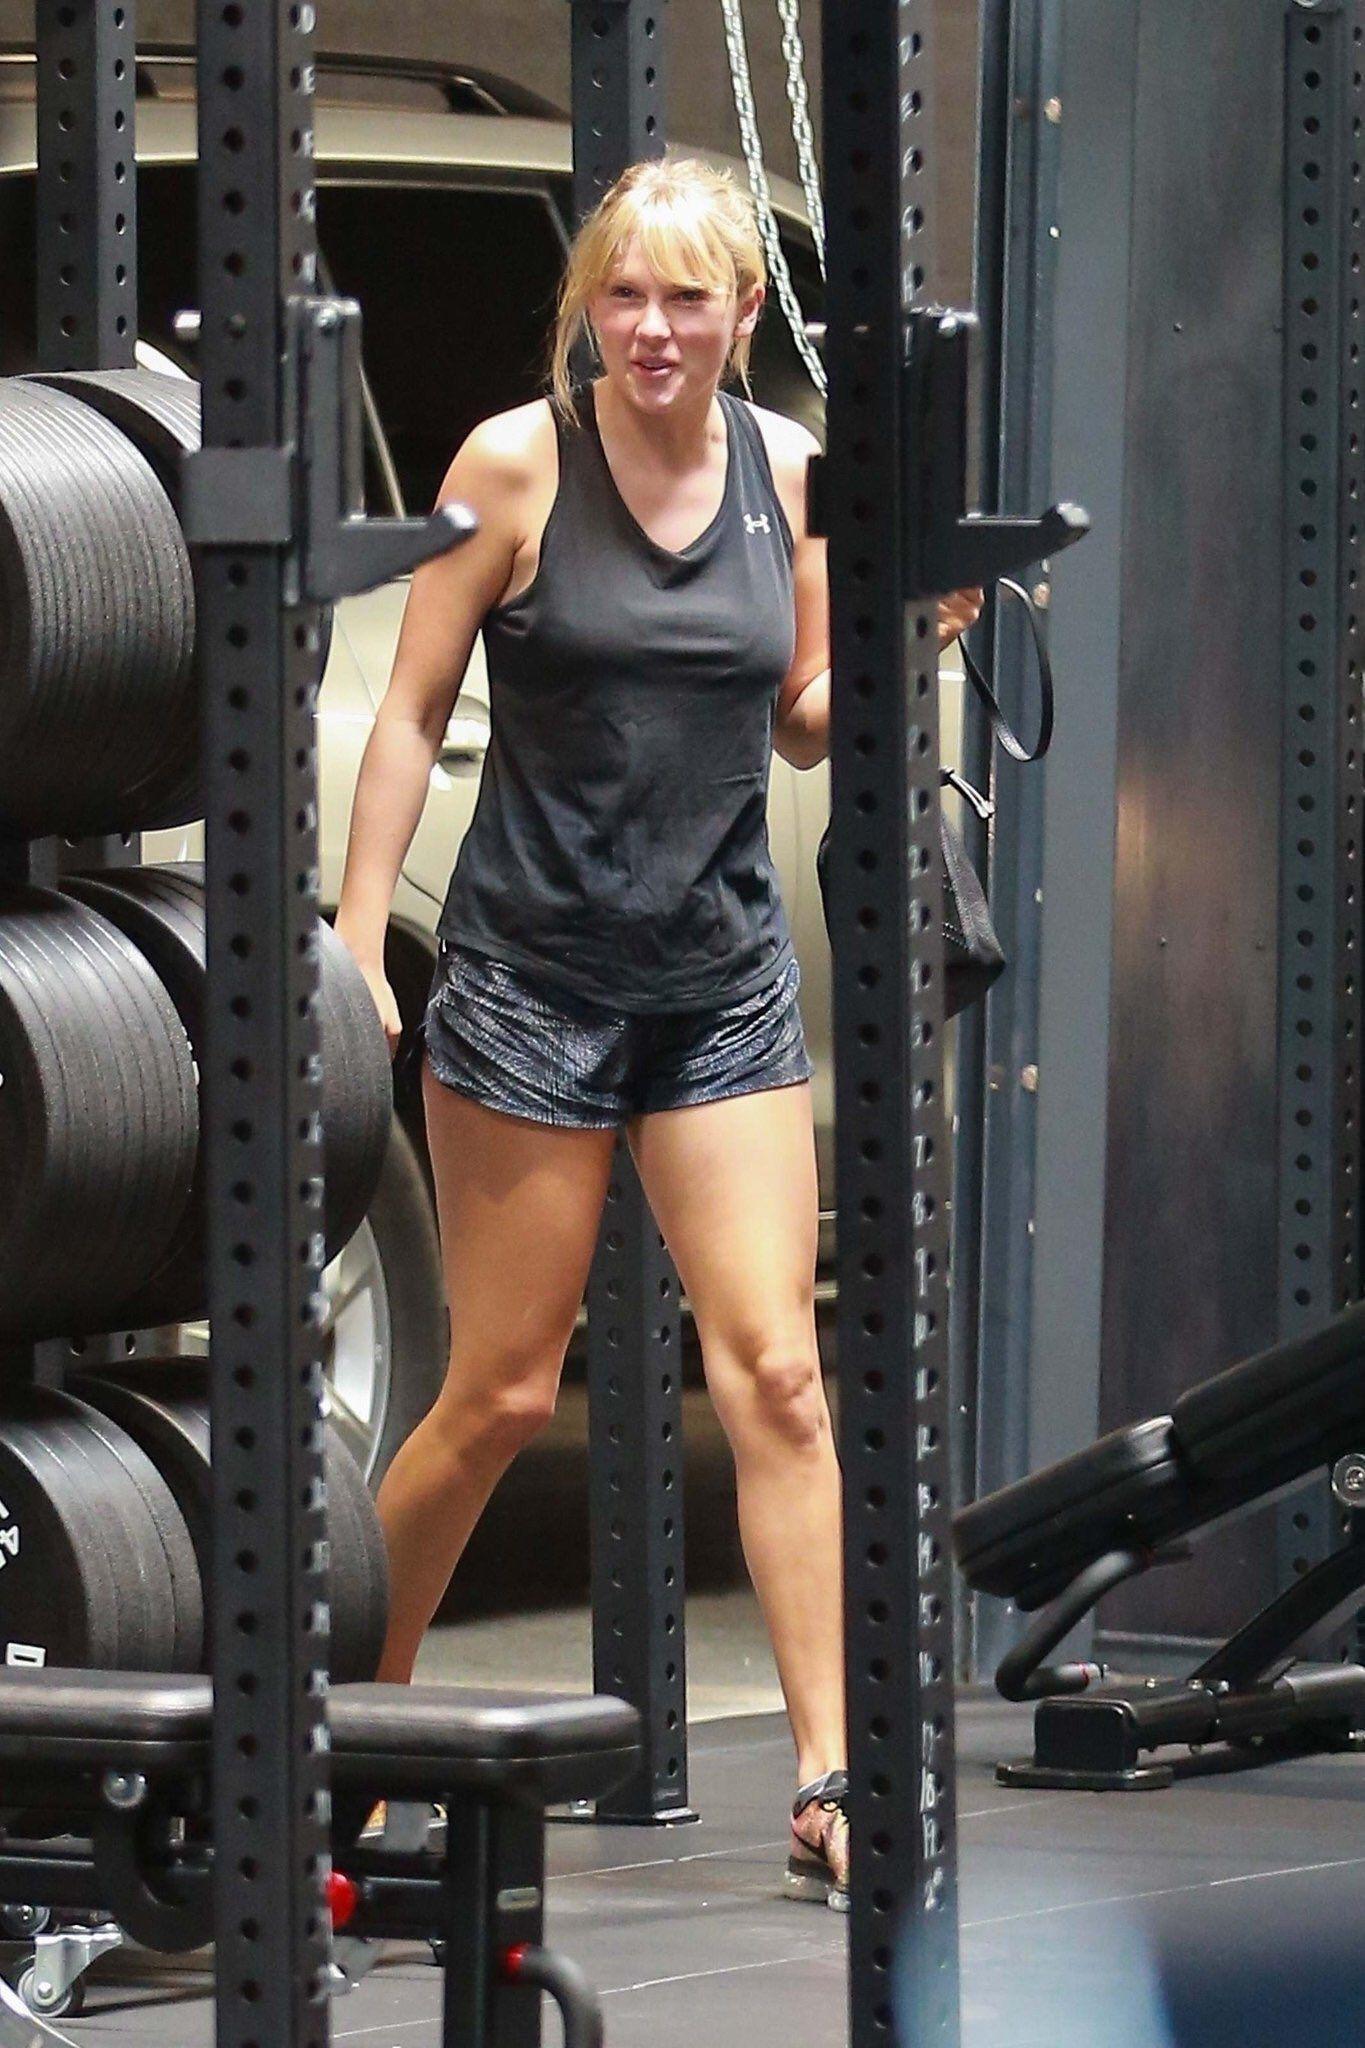 Taylor Swift Updates On Twitter Taylor Swift Street Style Taylor Swift Style Taylor Swift Hot